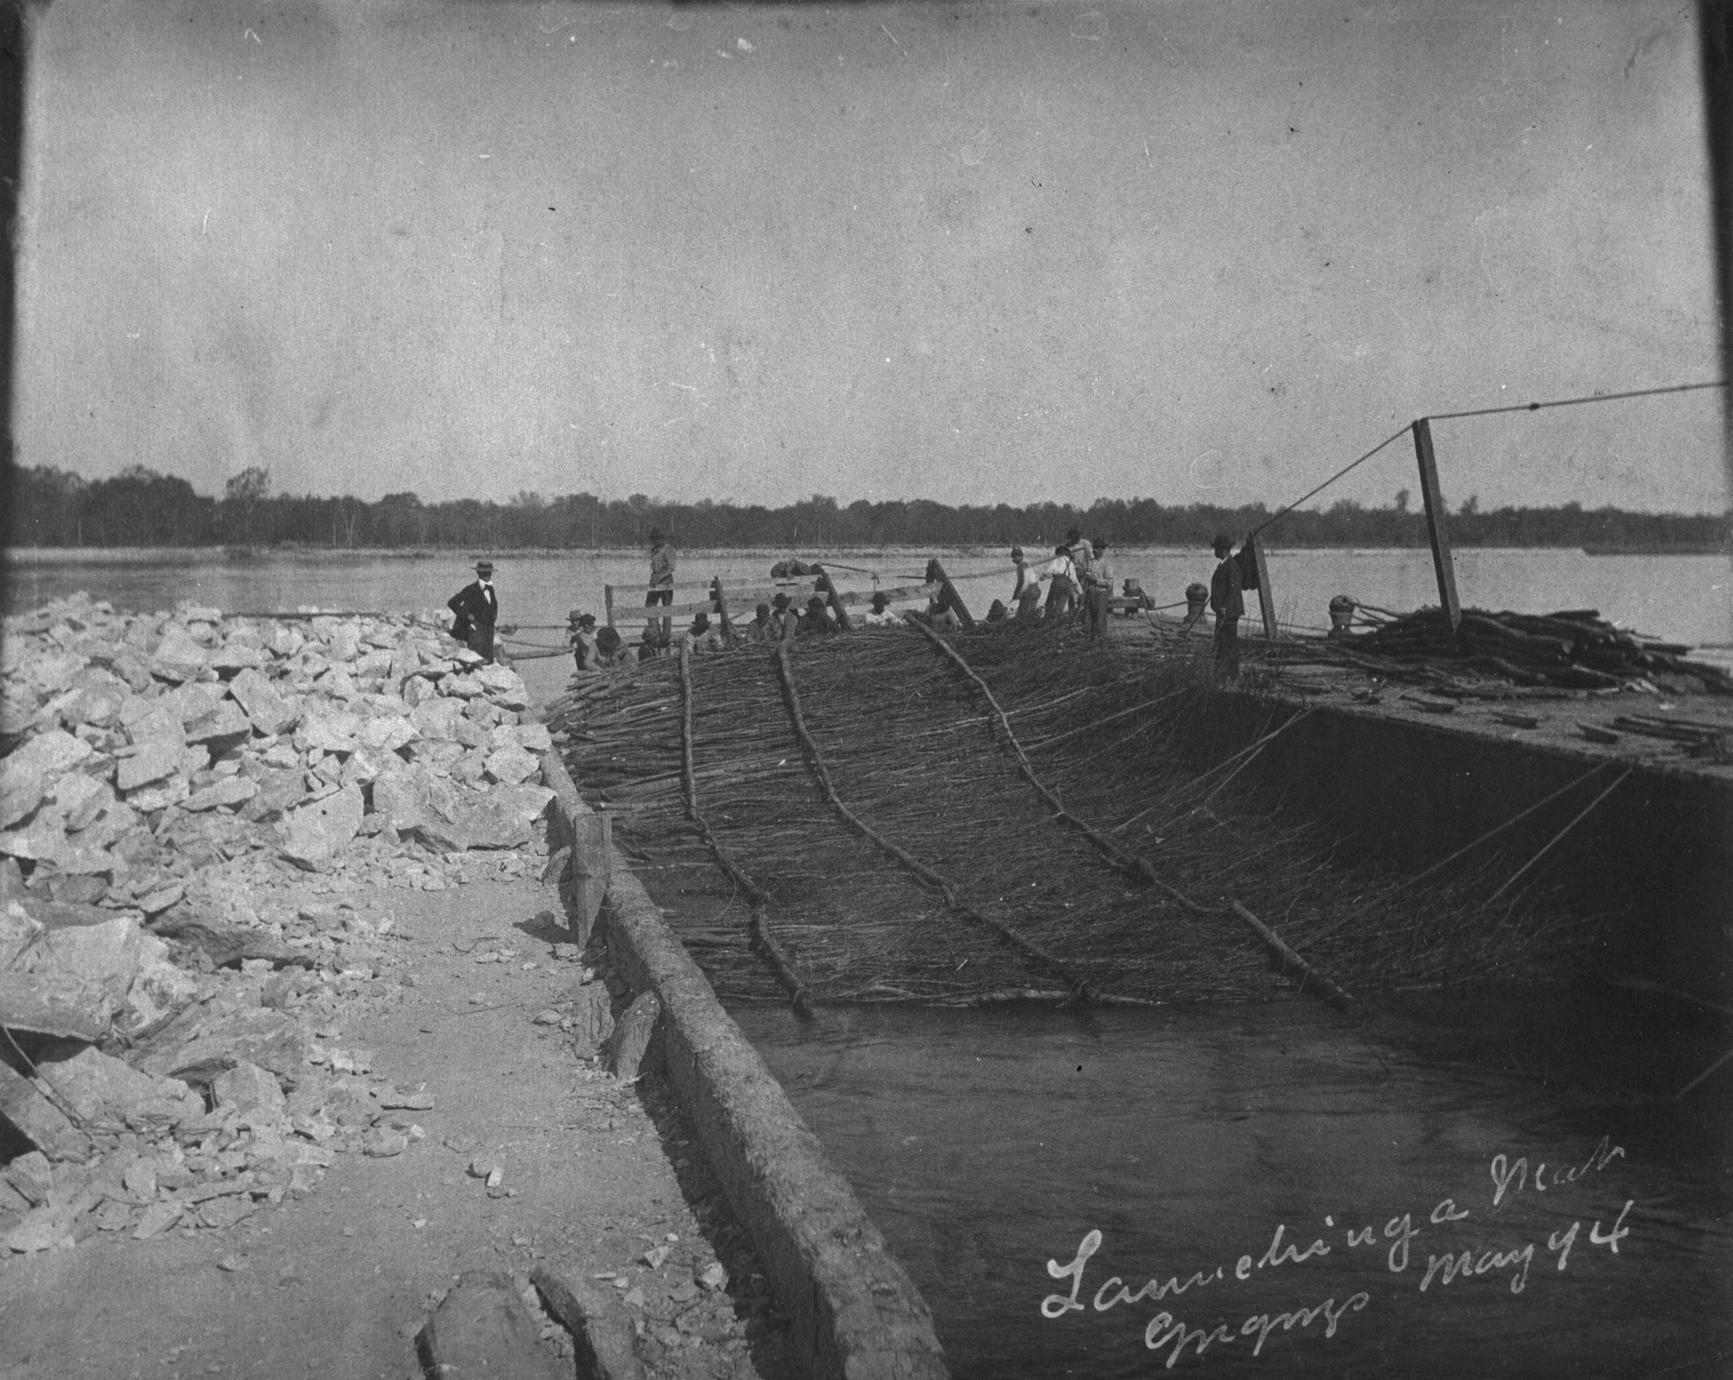 Wing Dam (River Improvements)